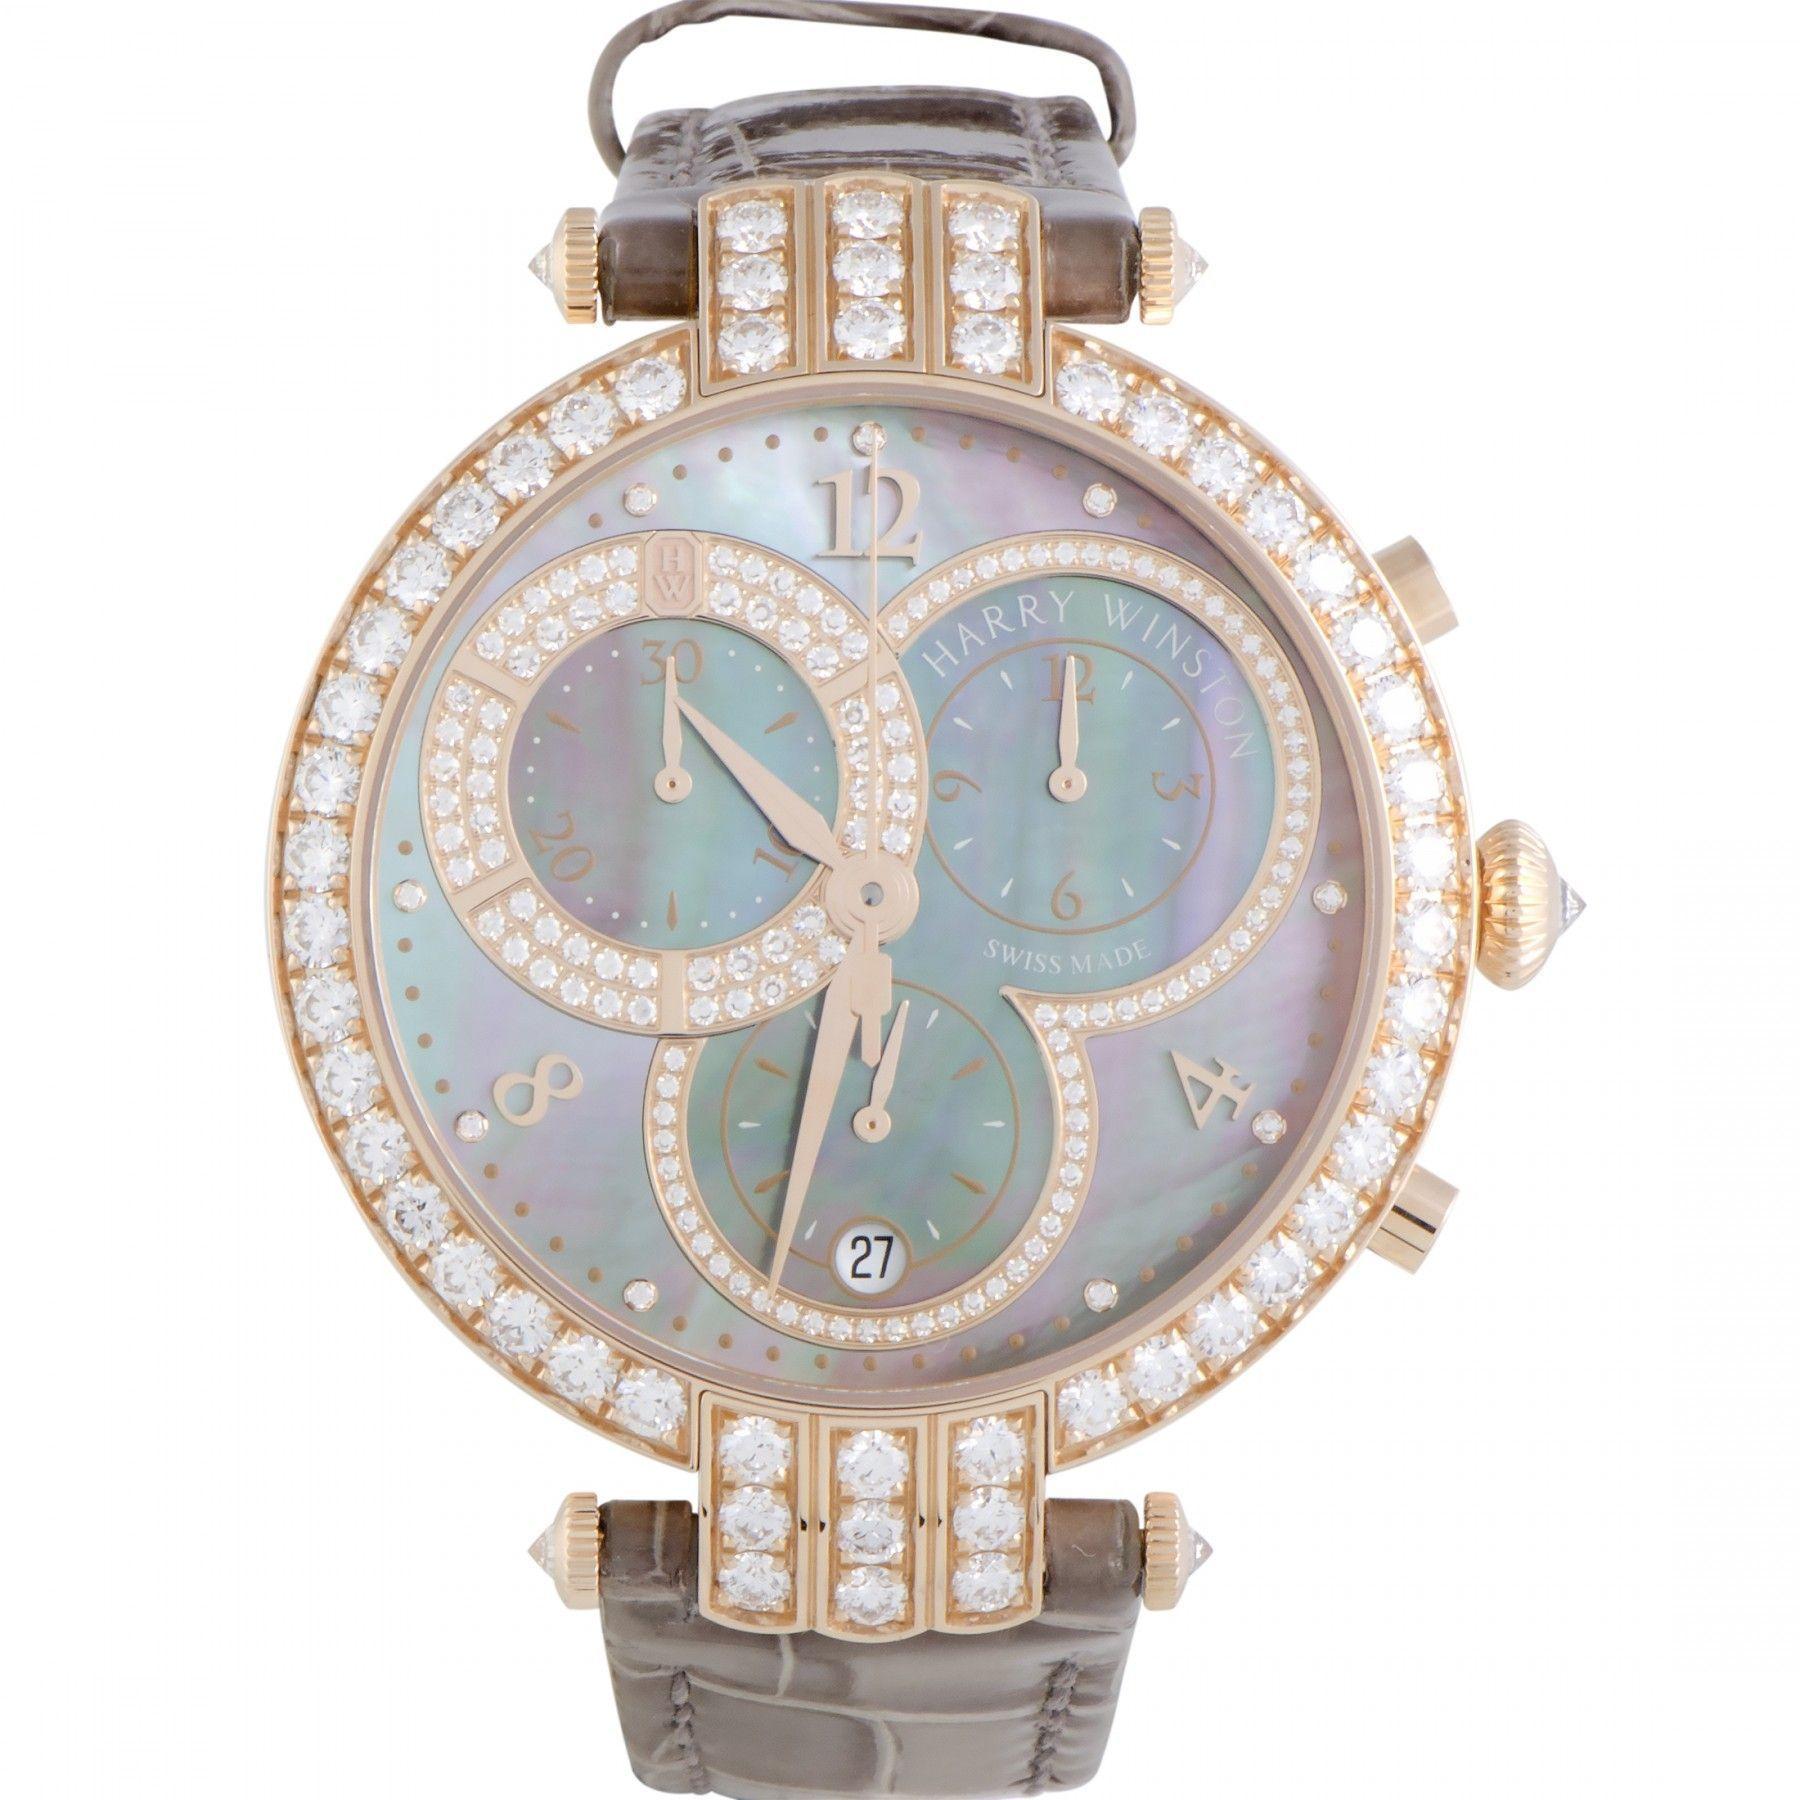 Harry Winston Premier Ladies Chronograph Watch PRNQCH40RR002